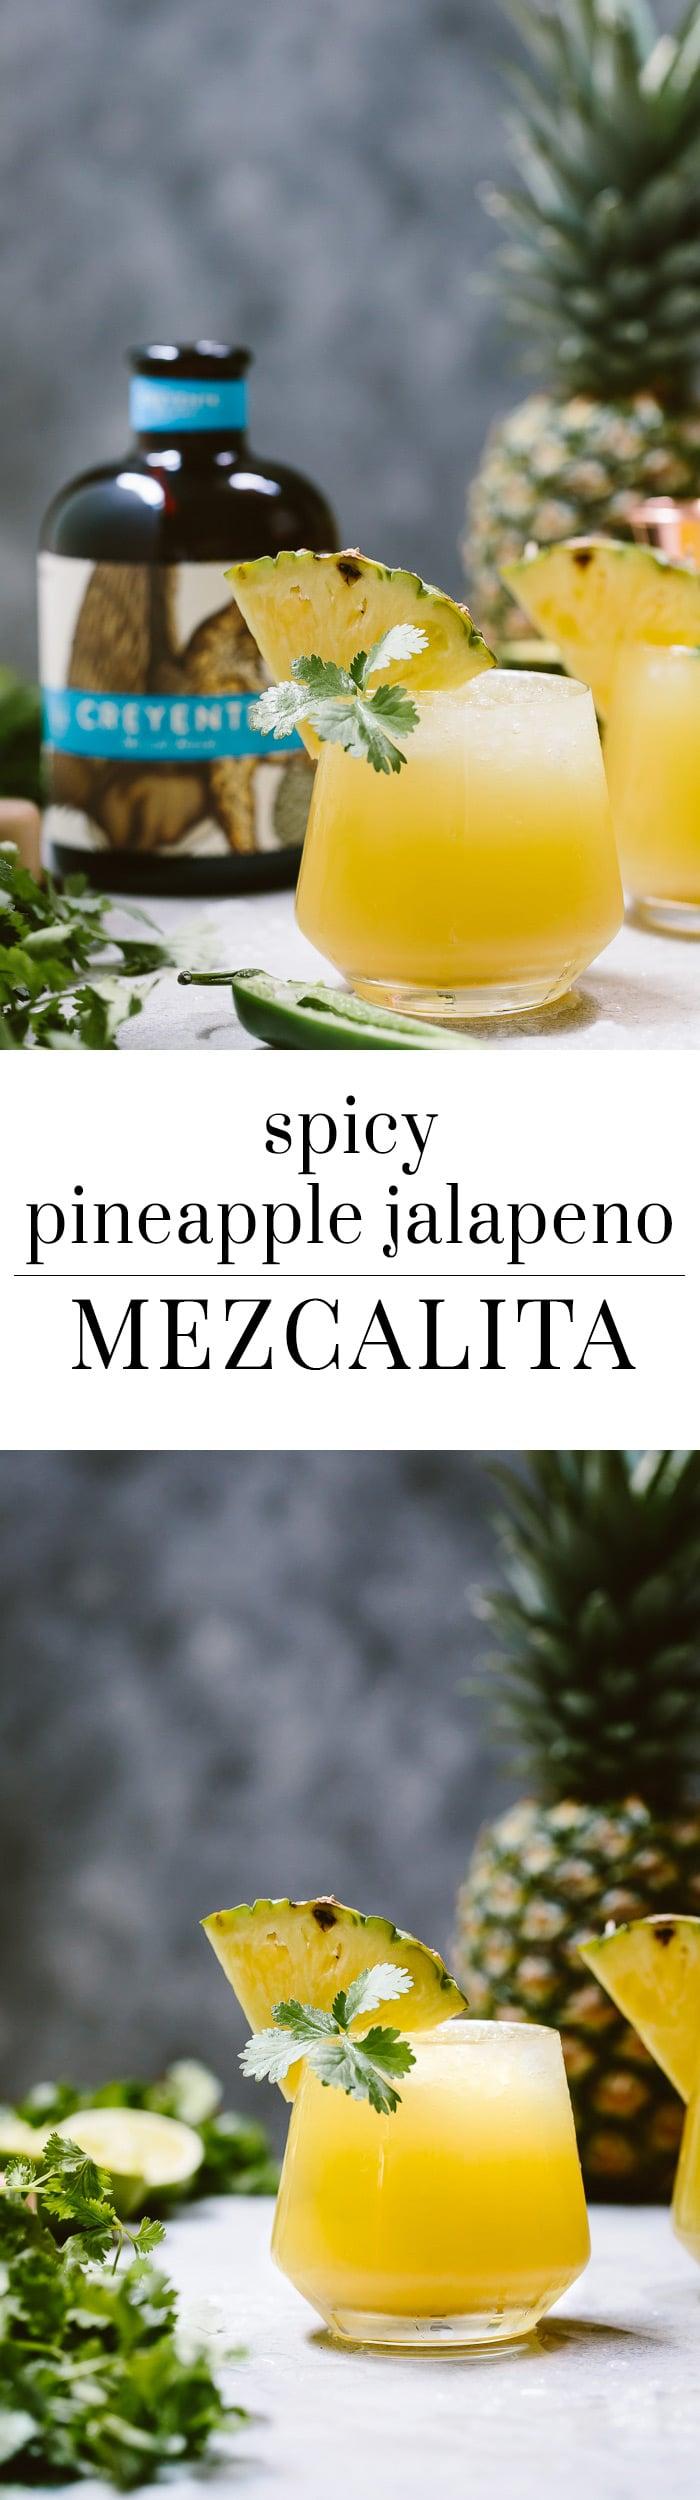 Spicy Pineapple Jalapeno Mezcalita - A refreshing cocktail made with Mezcal, pineapple, jalapenos, and cilantro.